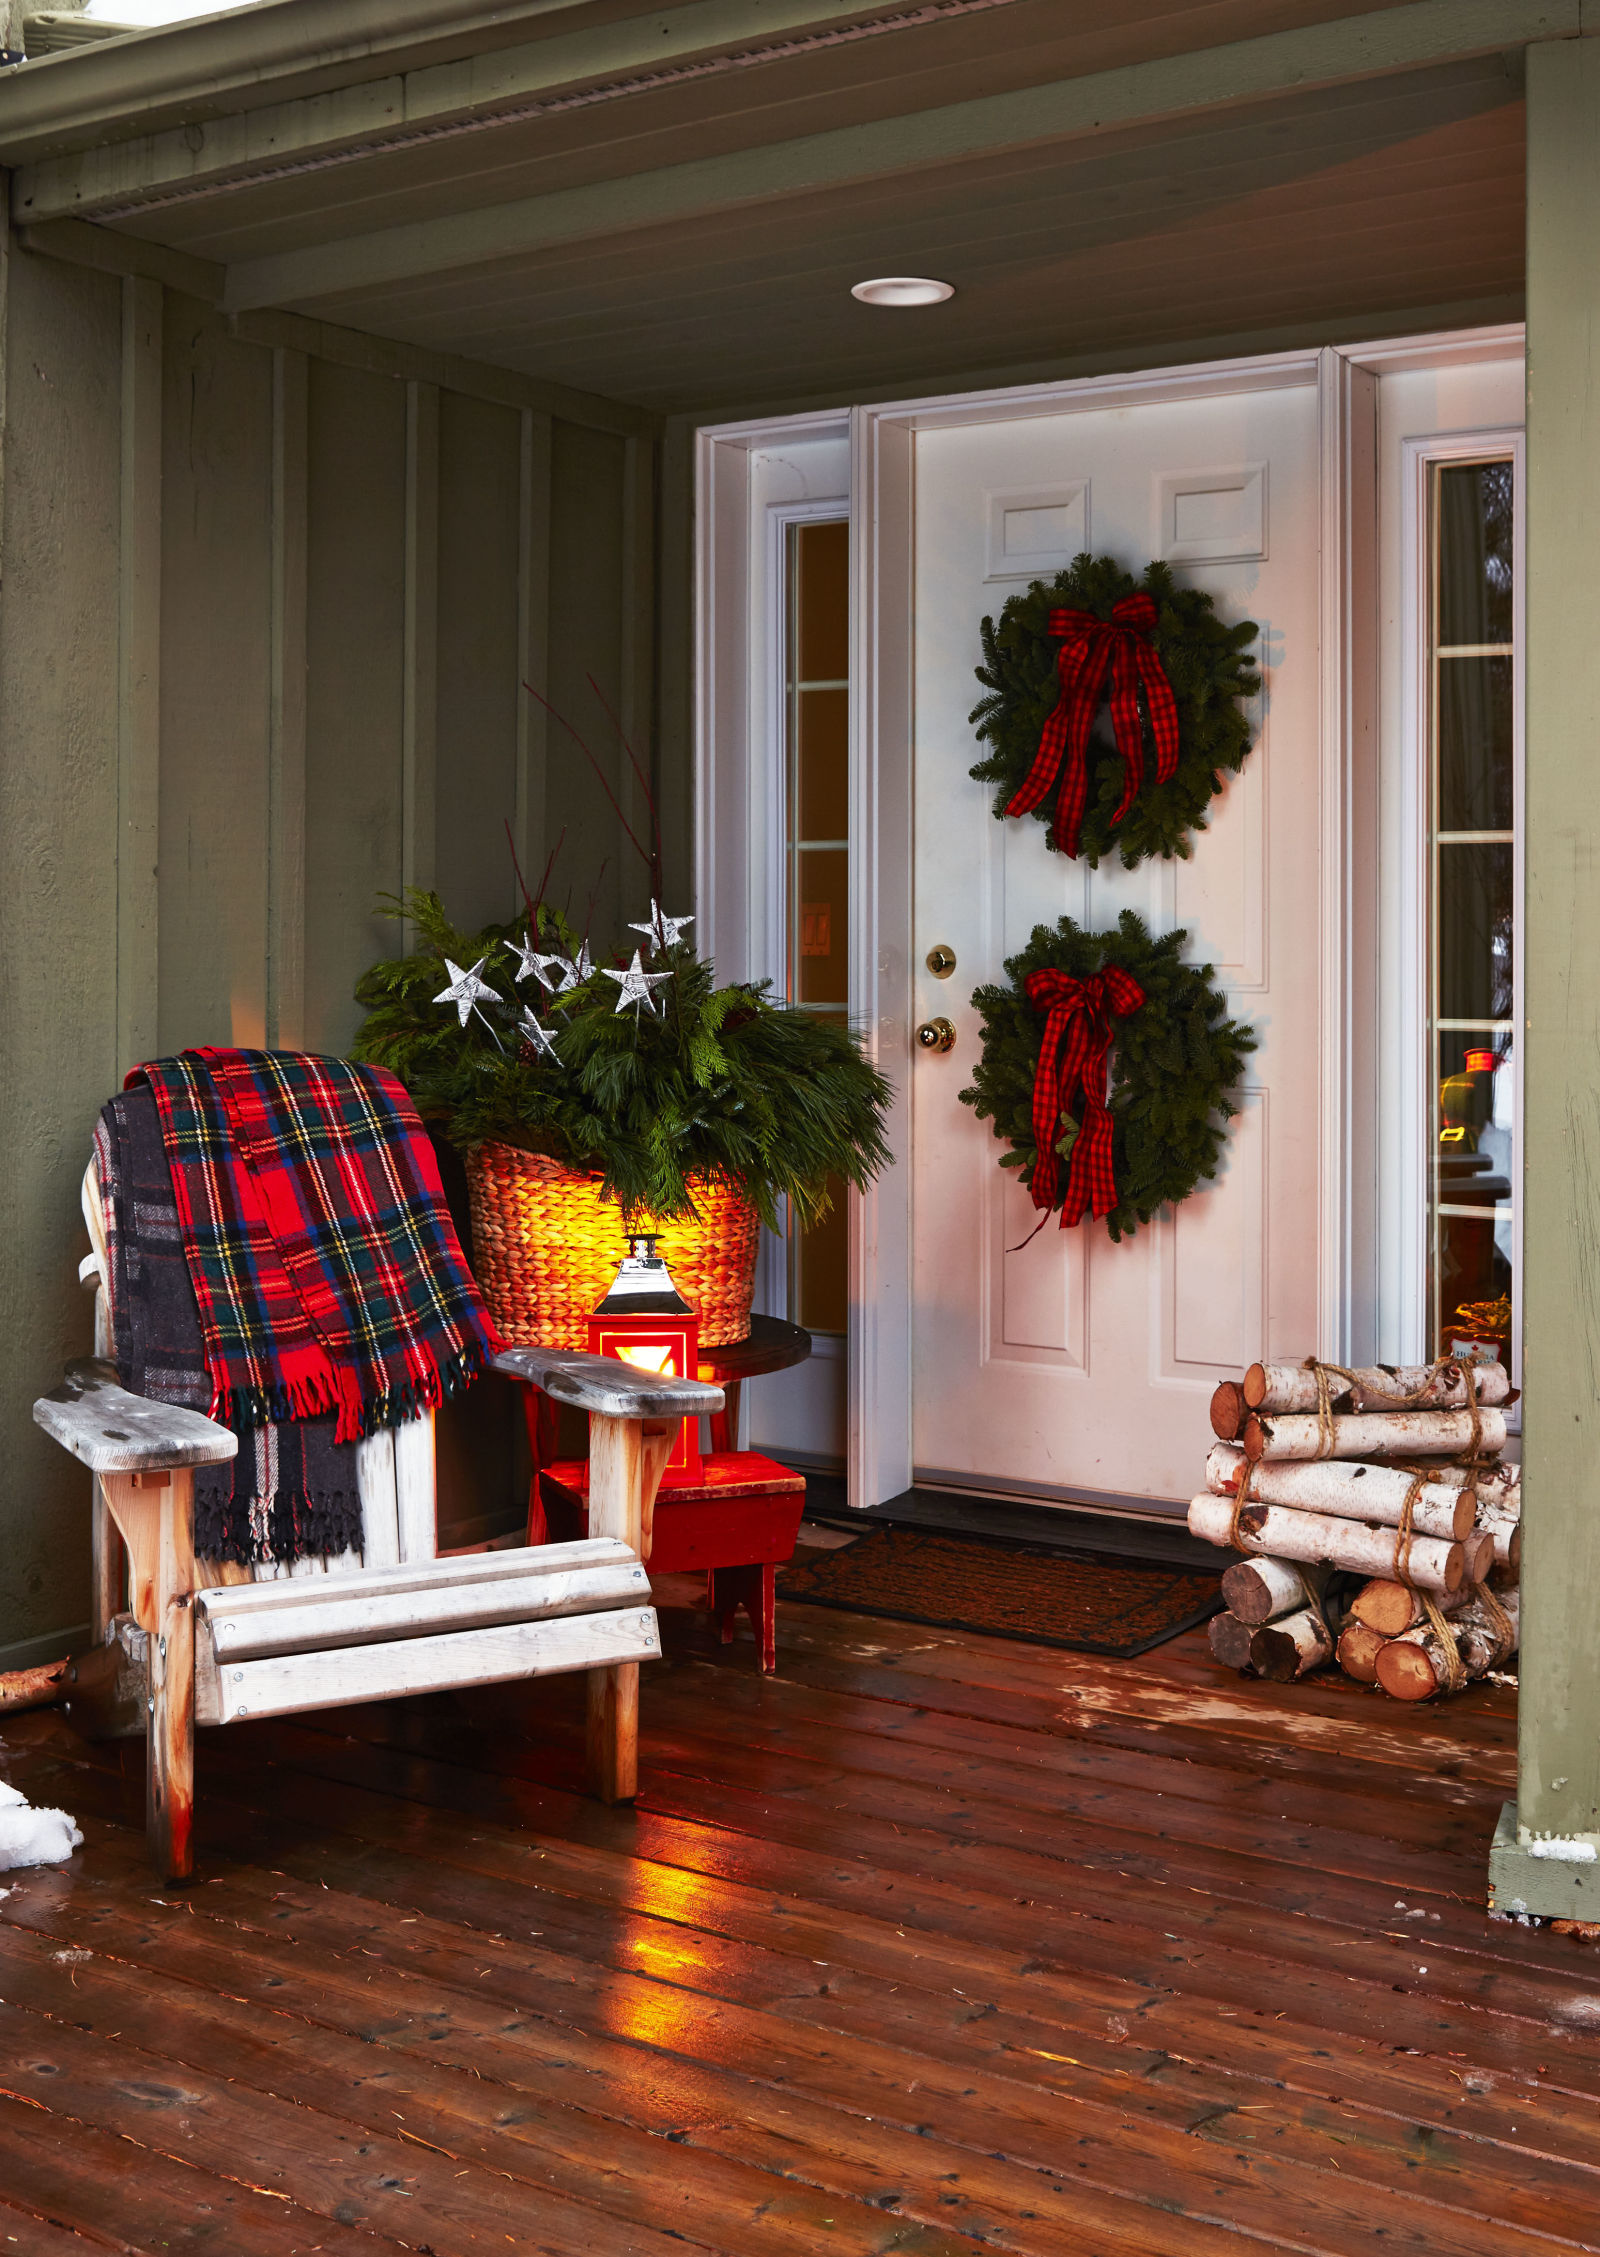 45 Christmas Home Decorating Ideas - Beautiful Christmas ...